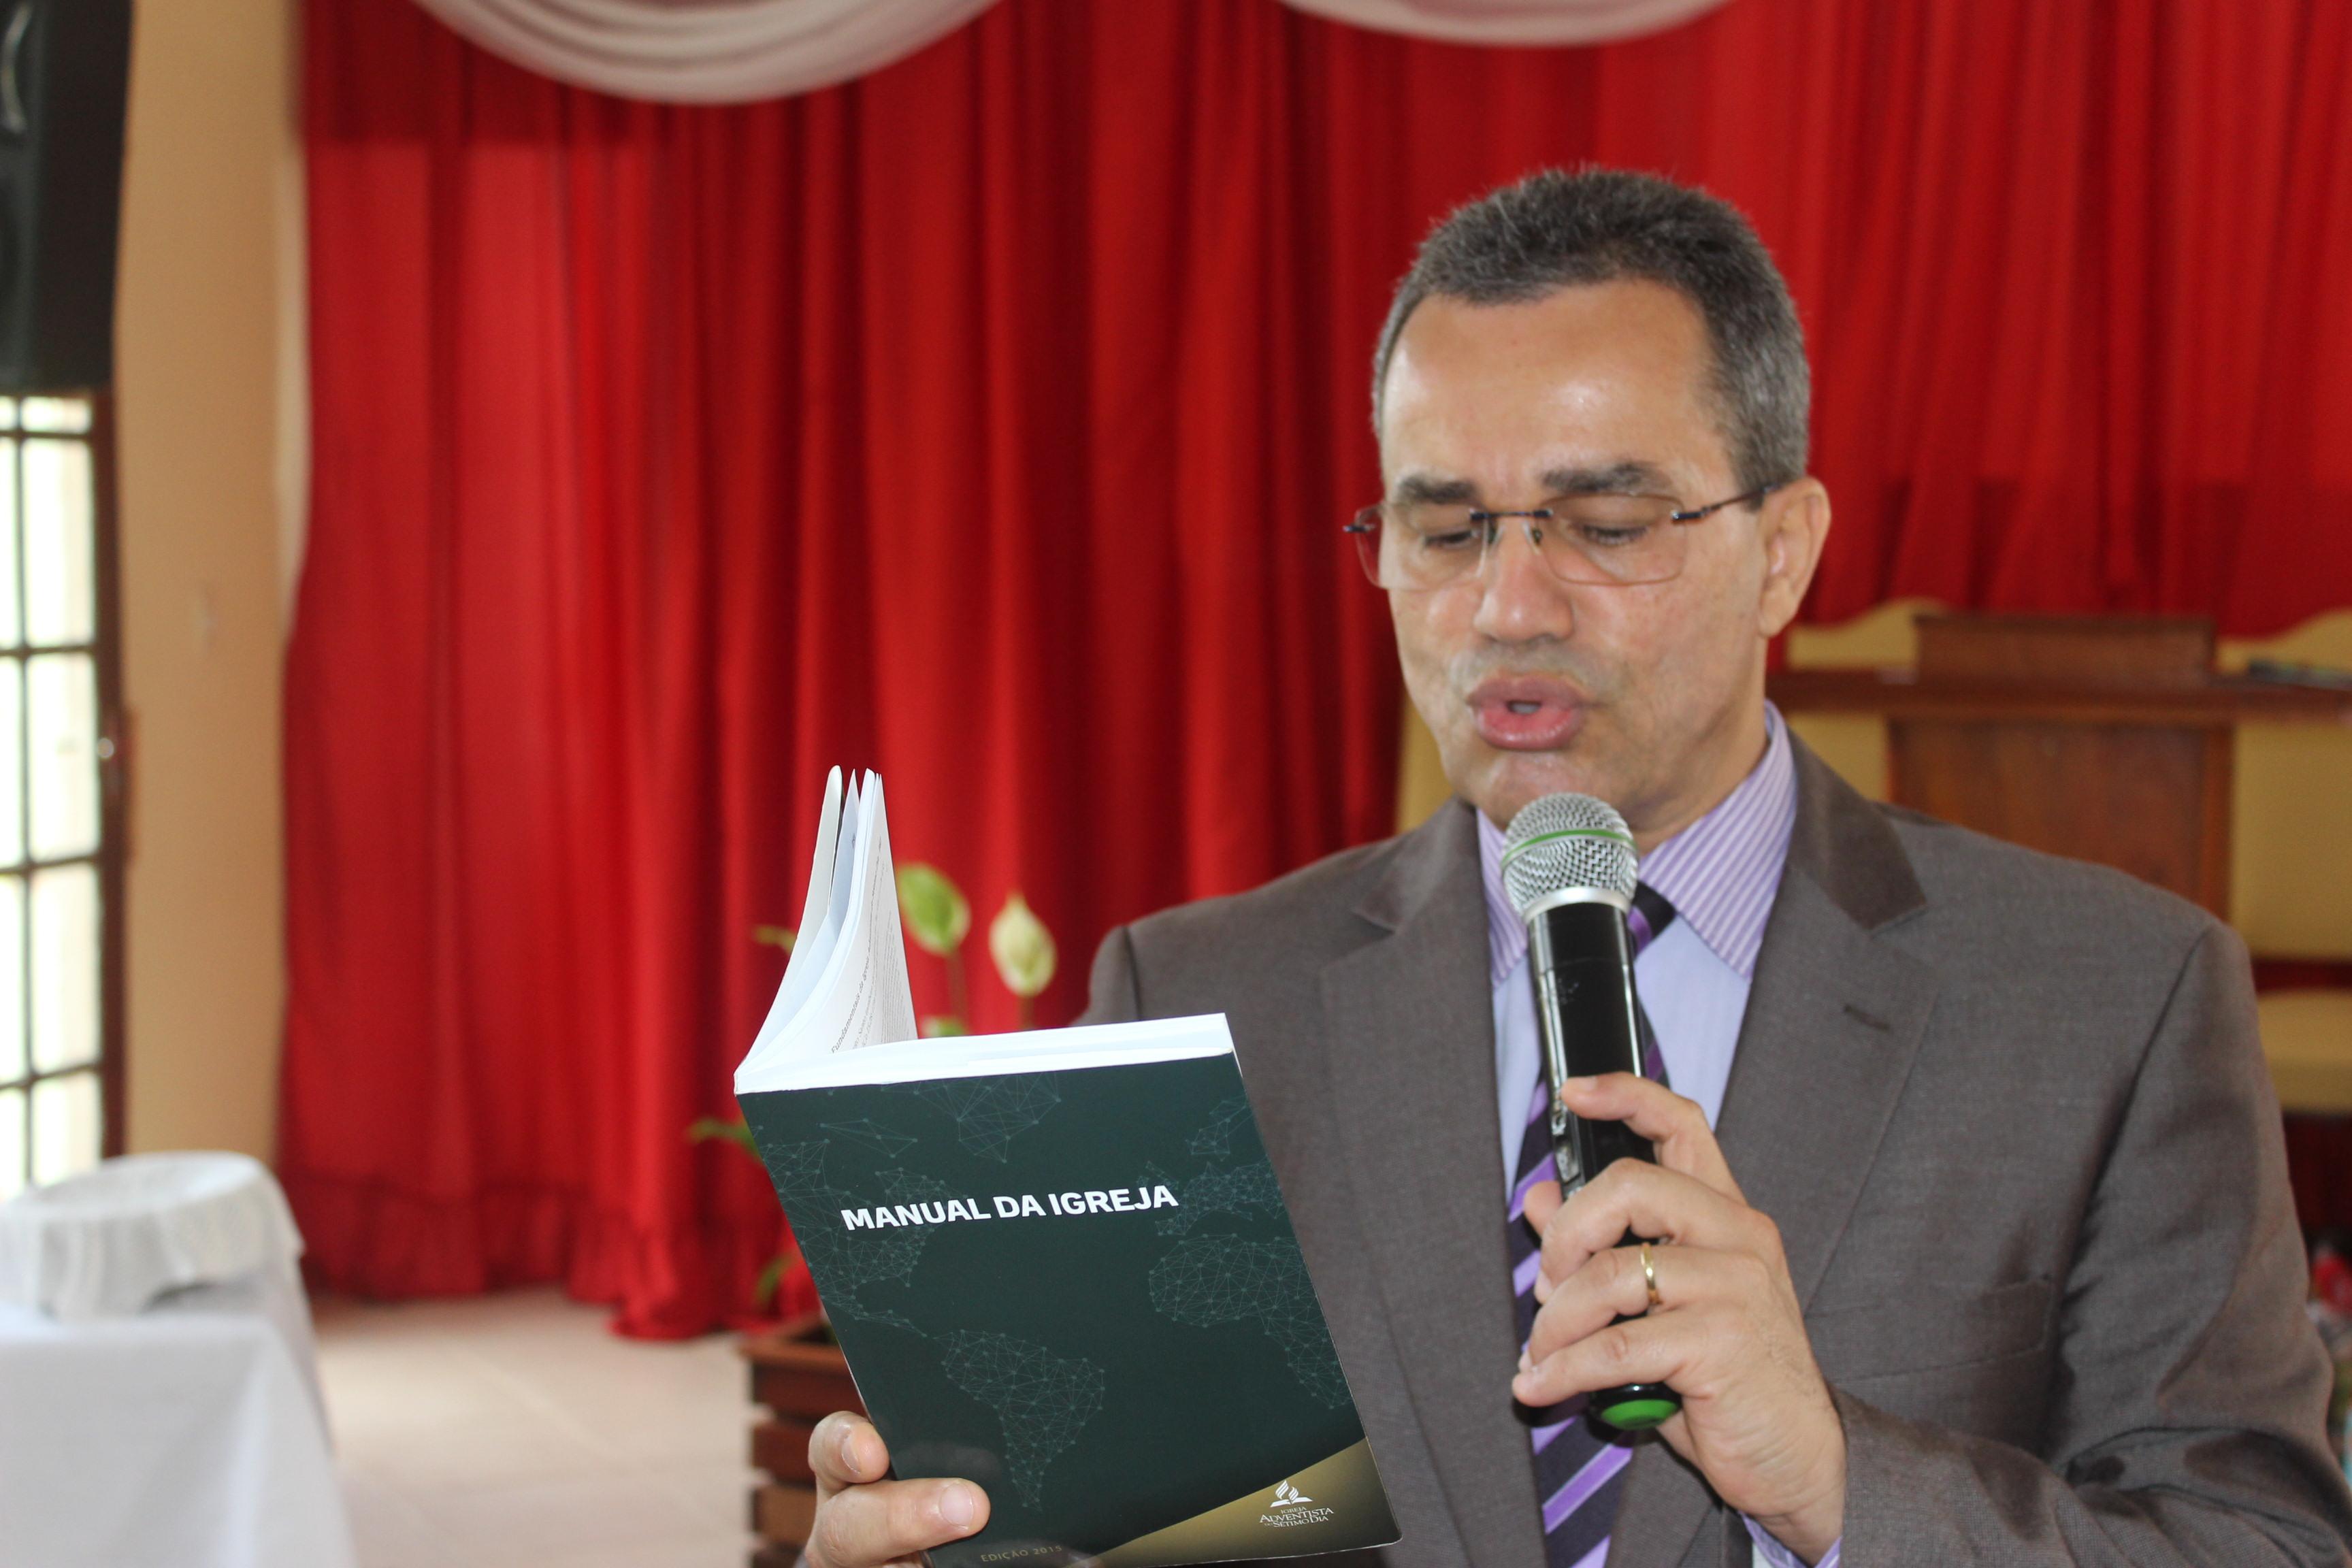 pastor-geovane-souza-explica-importancia-da-organizacao-da-igreja